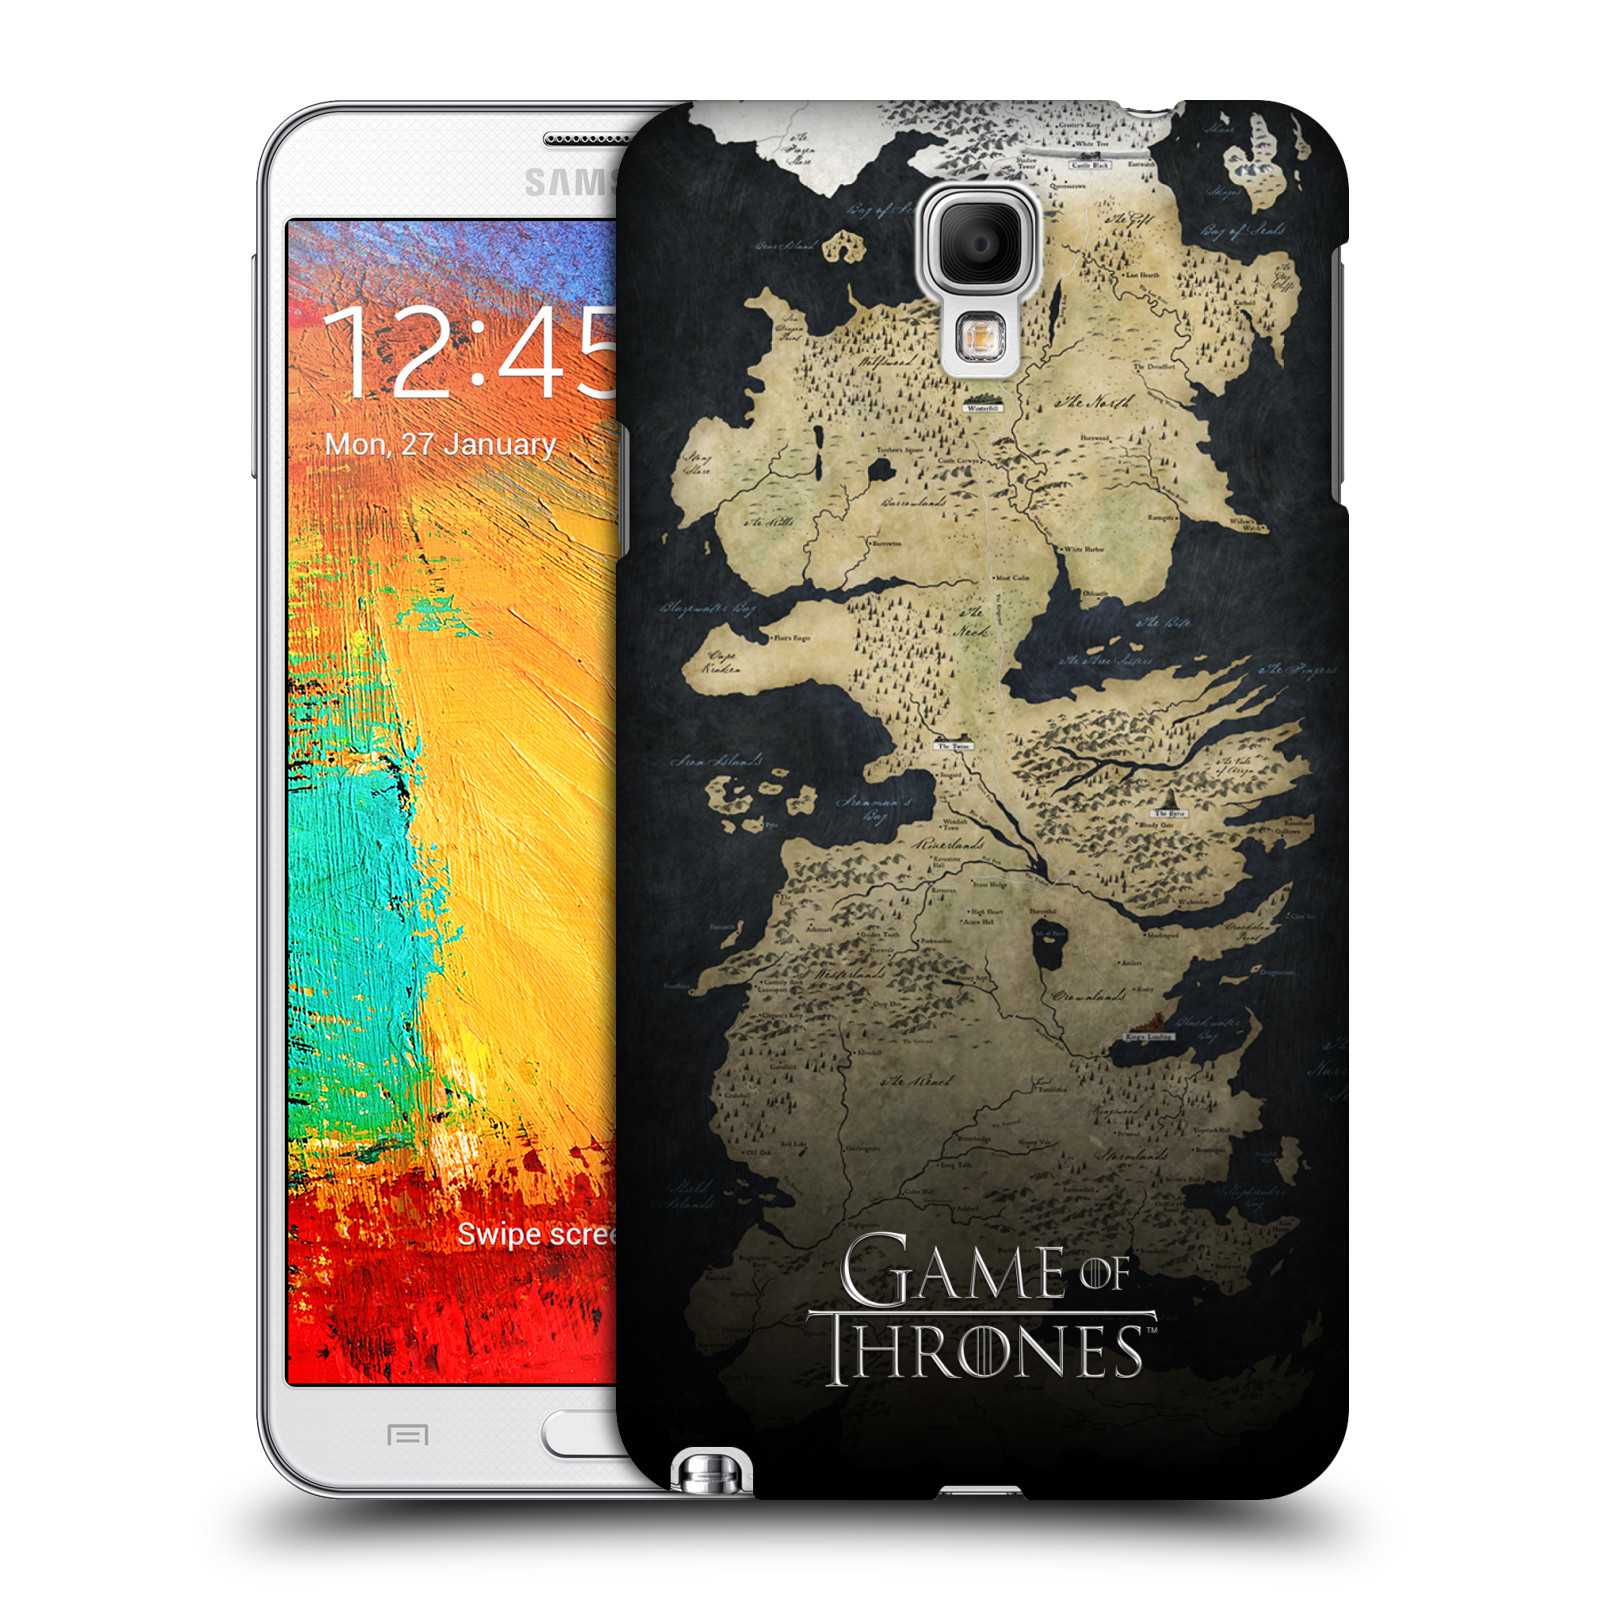 Plastové pouzdro na mobil Samsung Galaxy Note 3 Neo HEAD CASE Hra o trůny - Mapa západozemí (Kryt či obal na mobilní telefon s licencovaným motivem Hra o trůny / Game Of Thrones pro Samsung Galaxy Note 3 Neo SM-N7505)